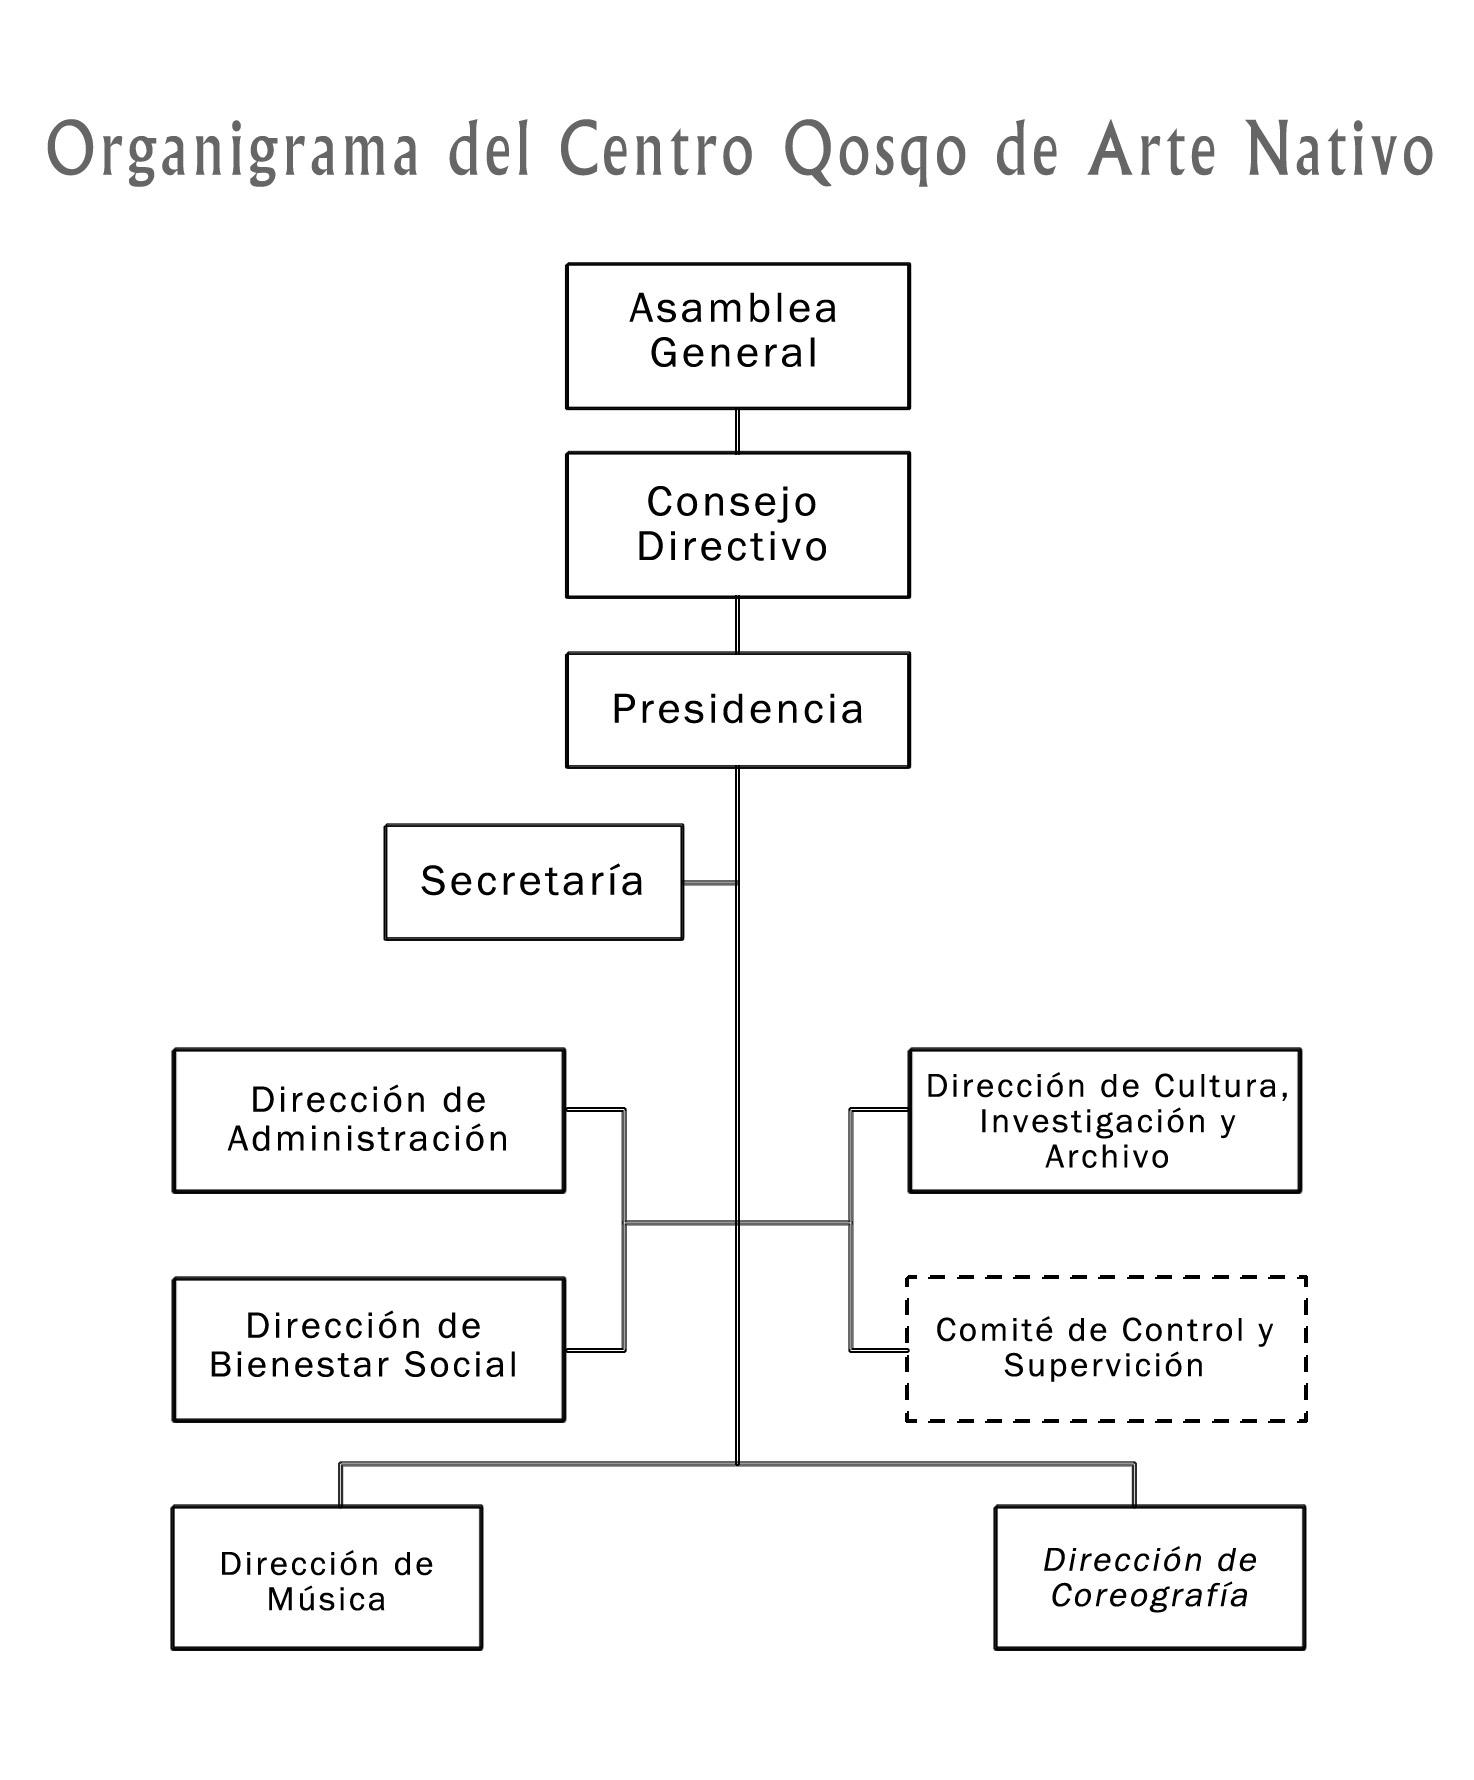 organigrama-centro-qosqo-de-arte-nativo